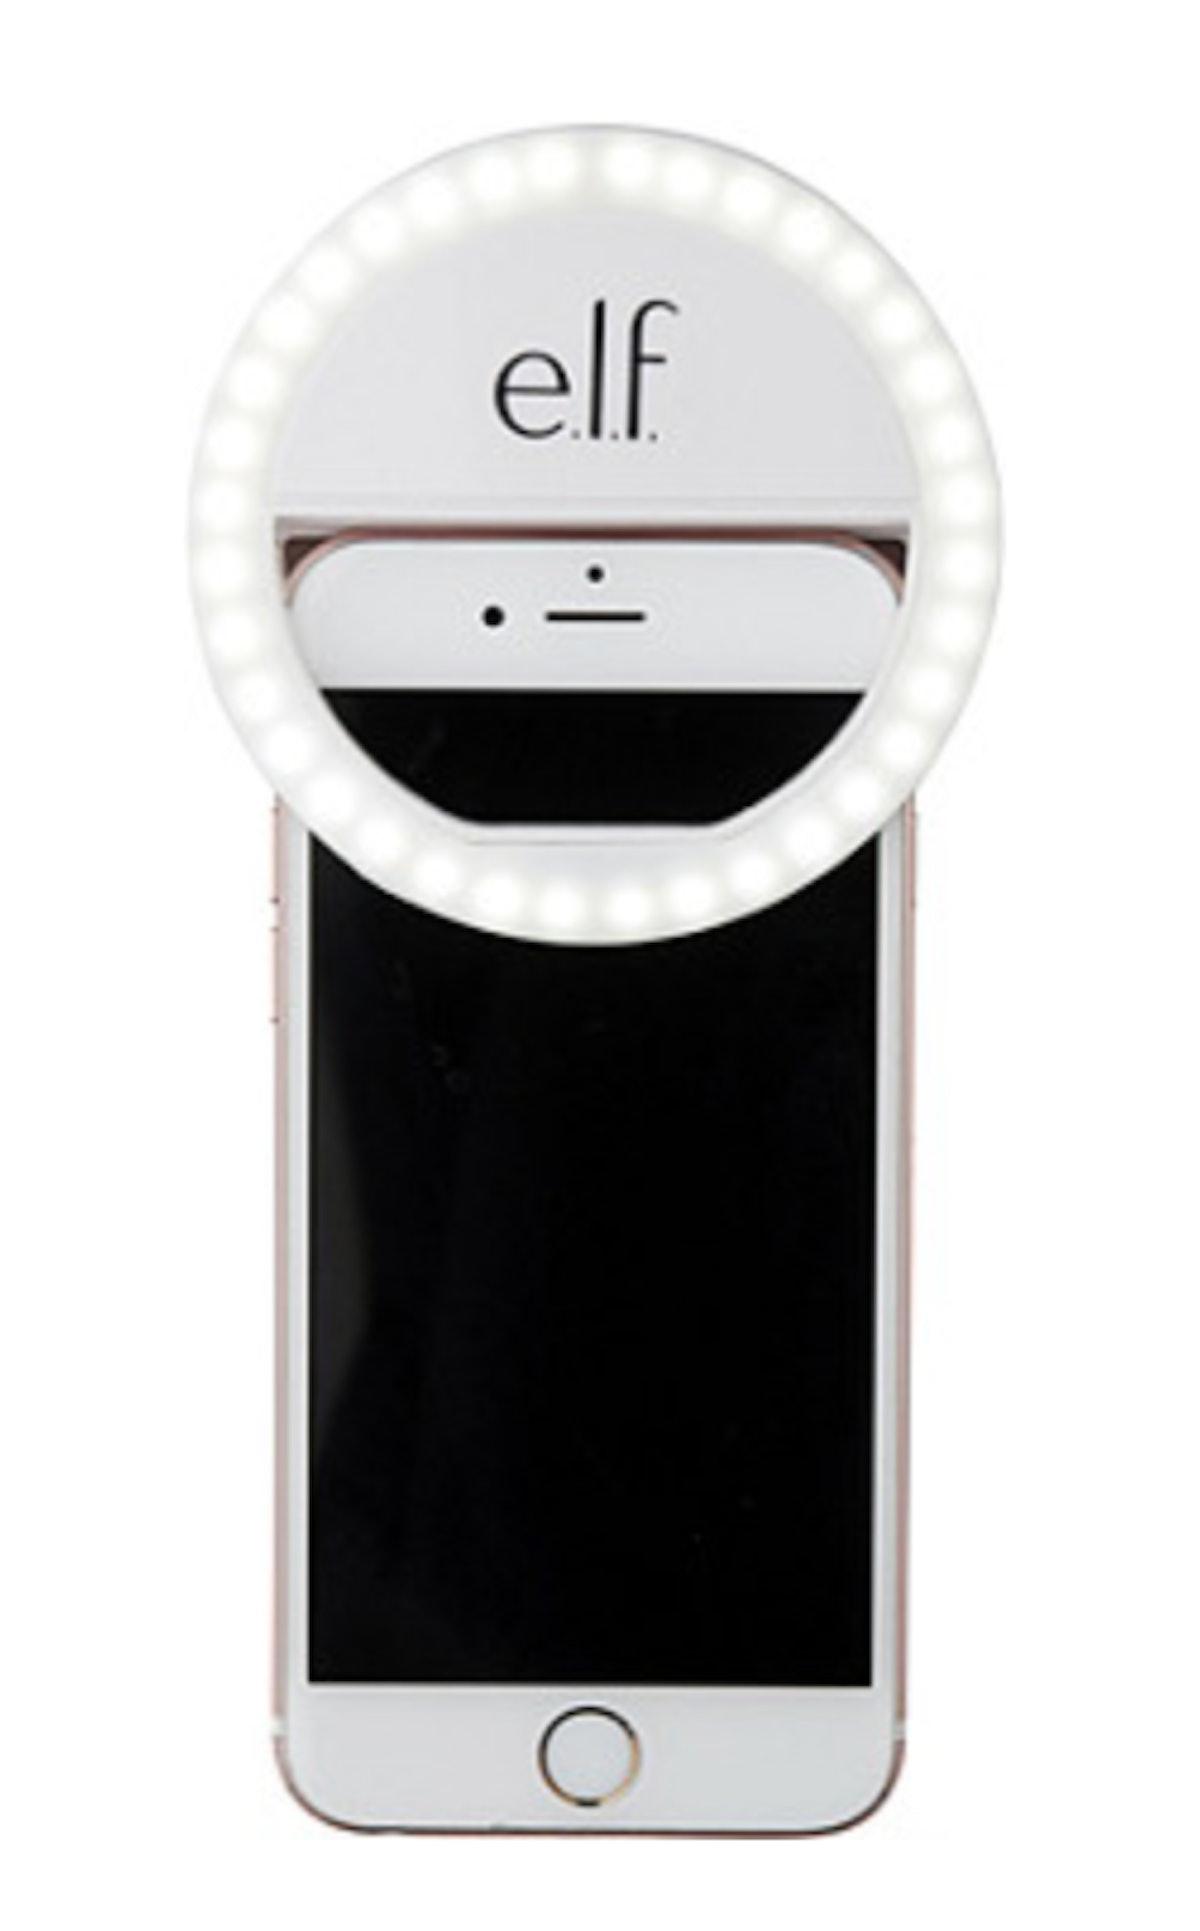 e.l.f Cosmetics Glow On The Go Selfie Light